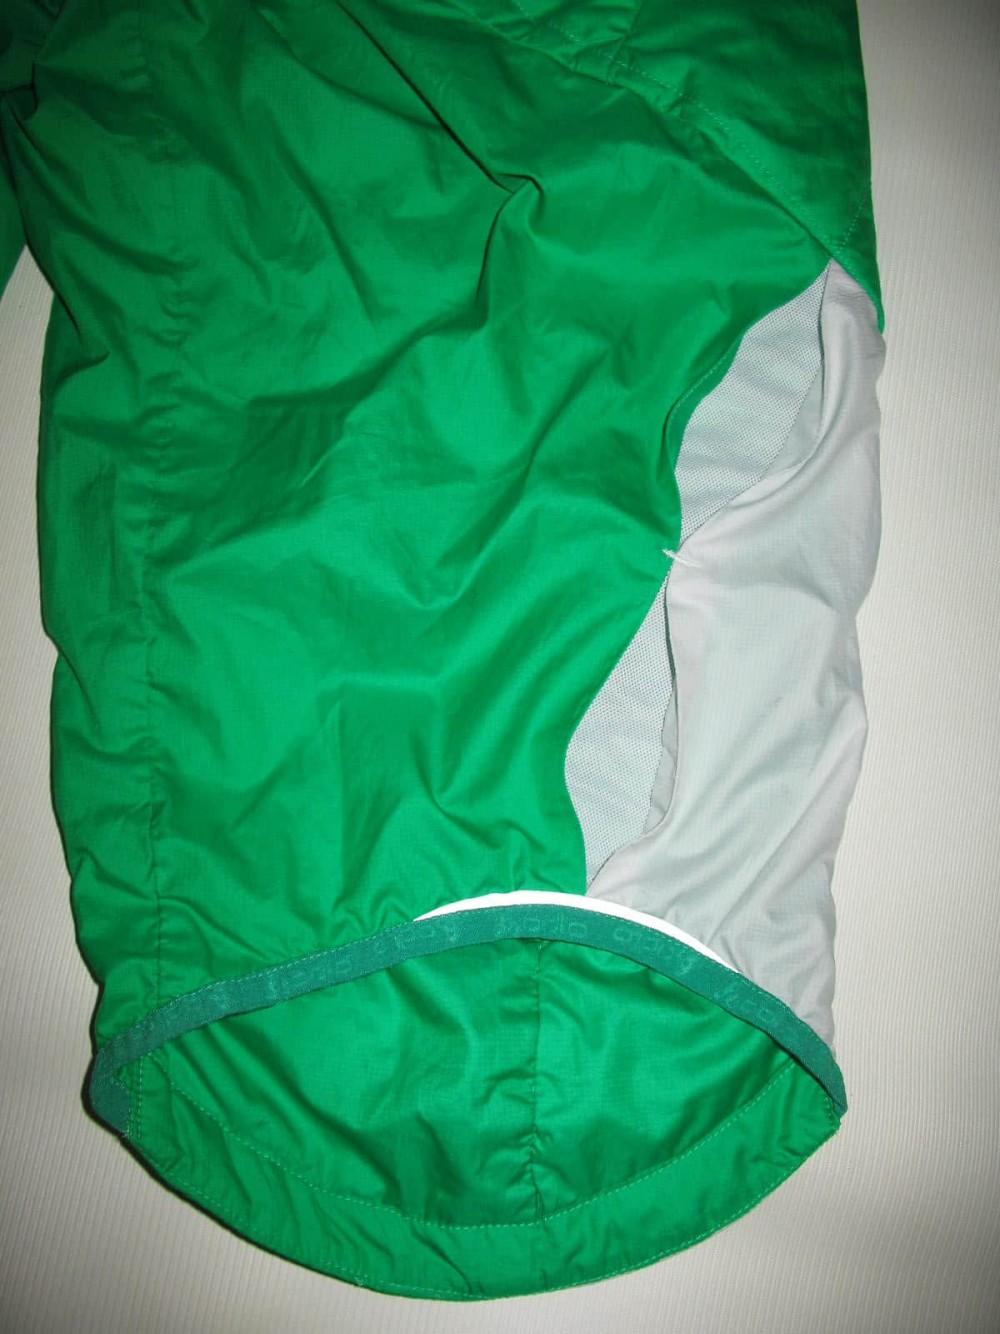 Шорты ODLO primaloft shorts lady (размер S/M) - 5